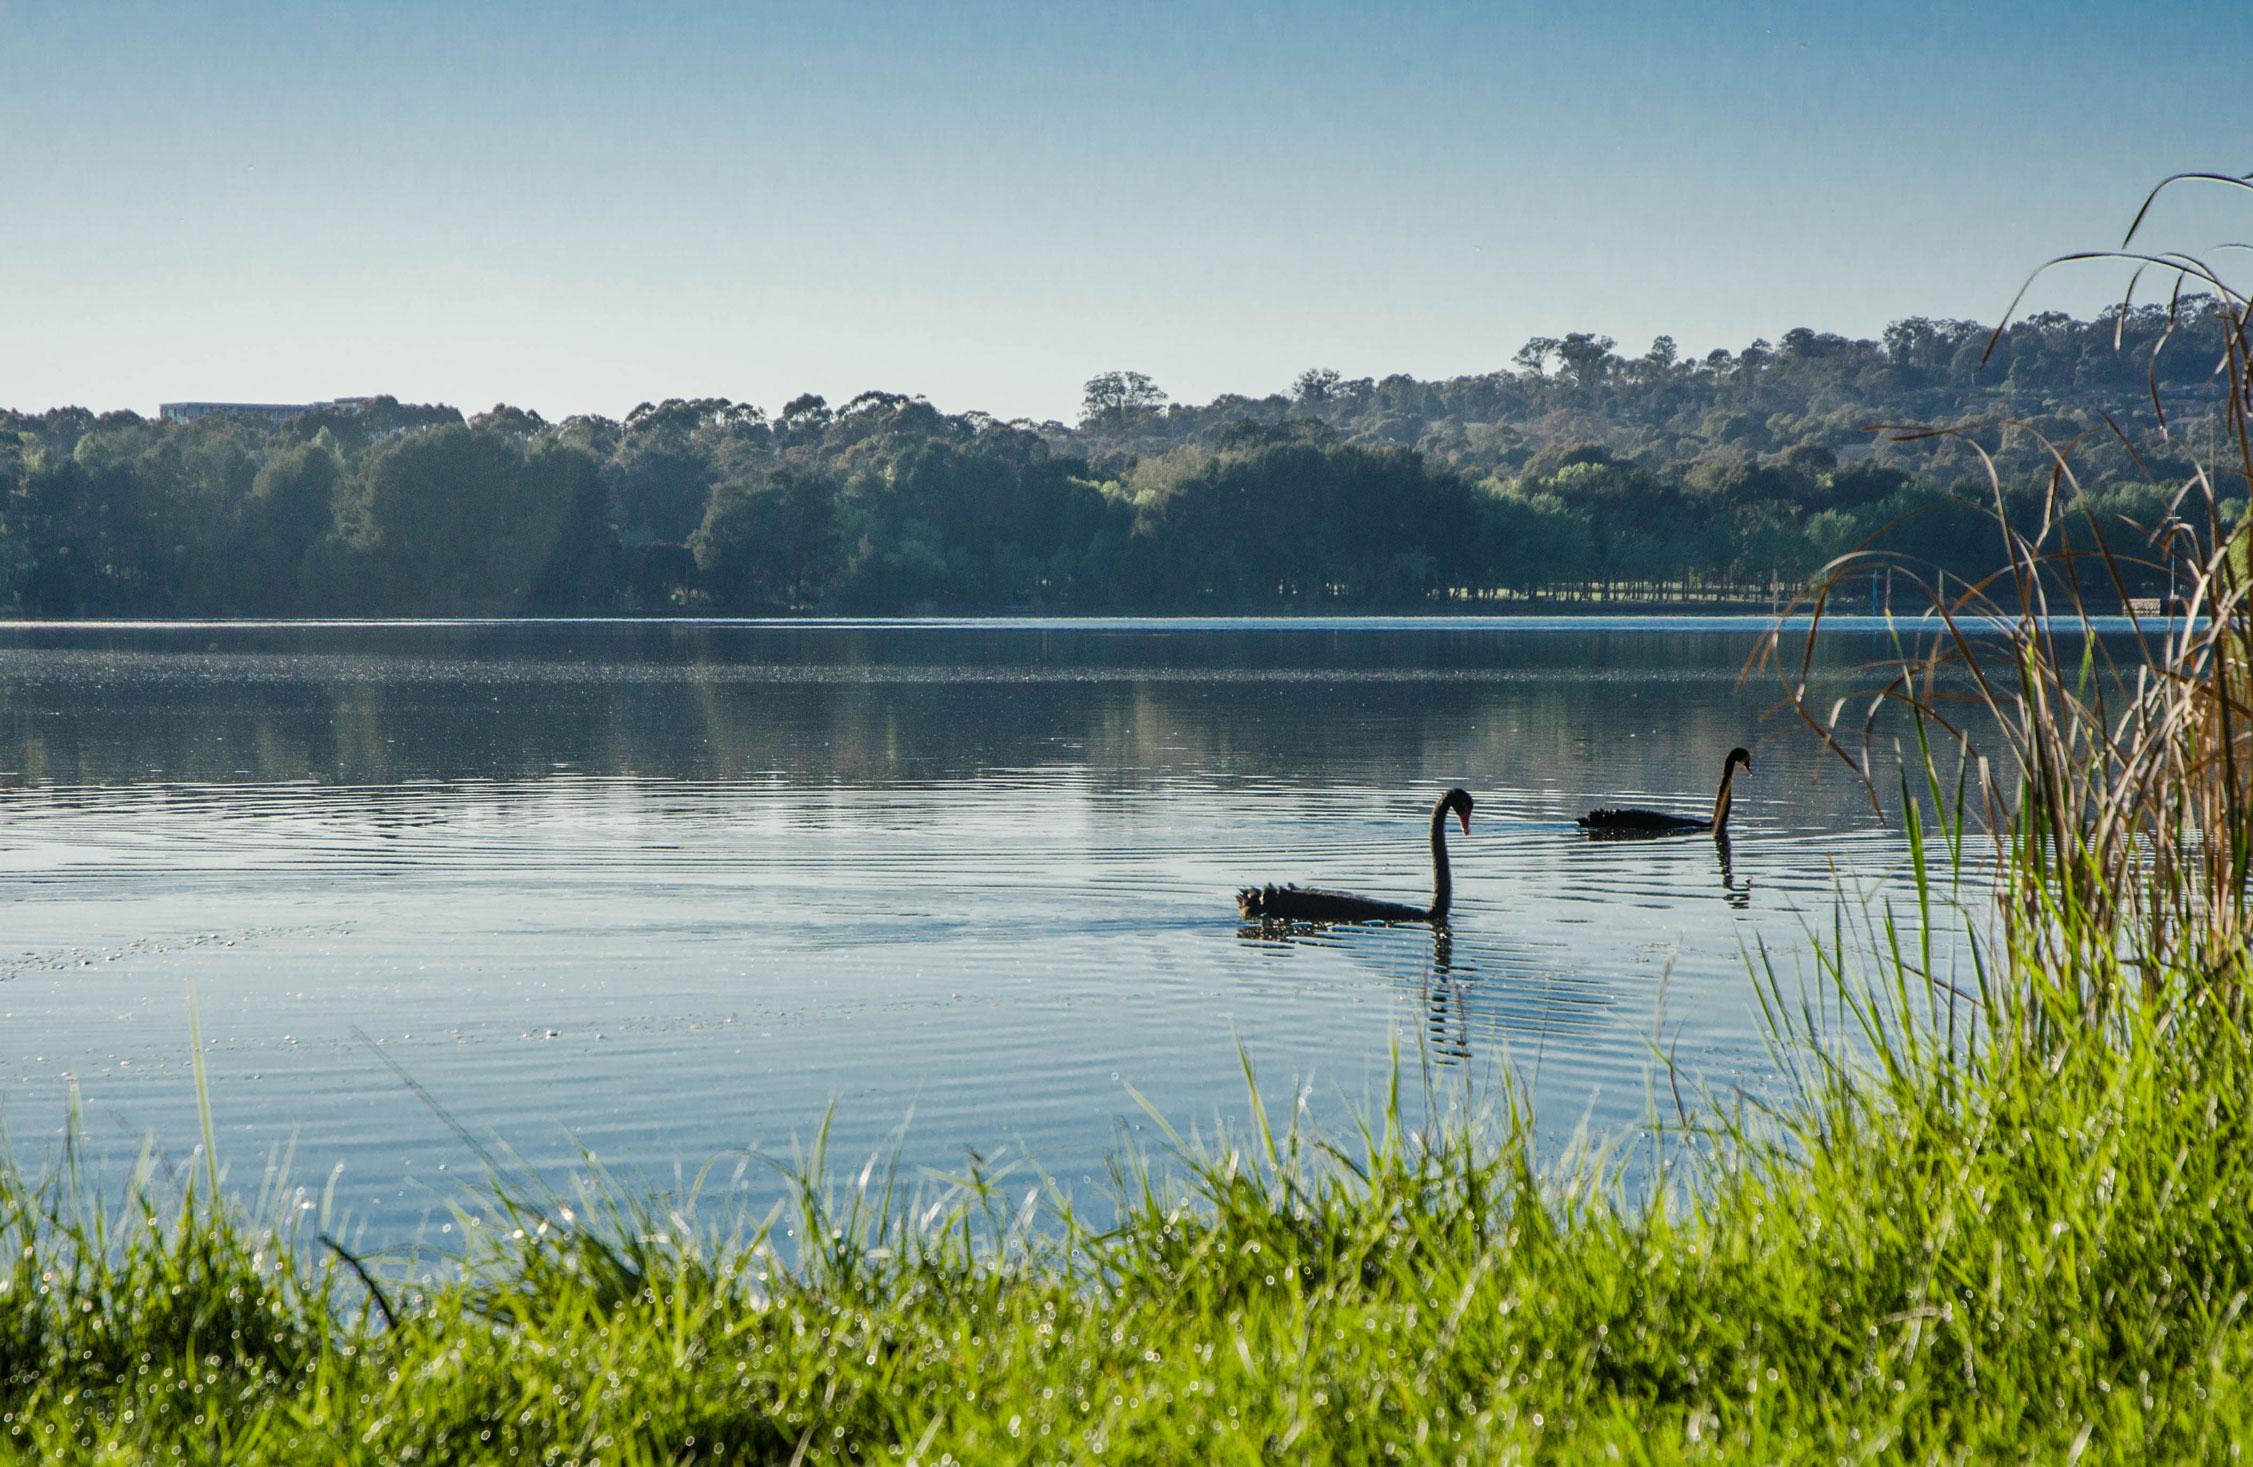 Paesaggi-Australia - DSC 0001 9 - Ginninderra Lake Australia - Ginninderra Lake Australia